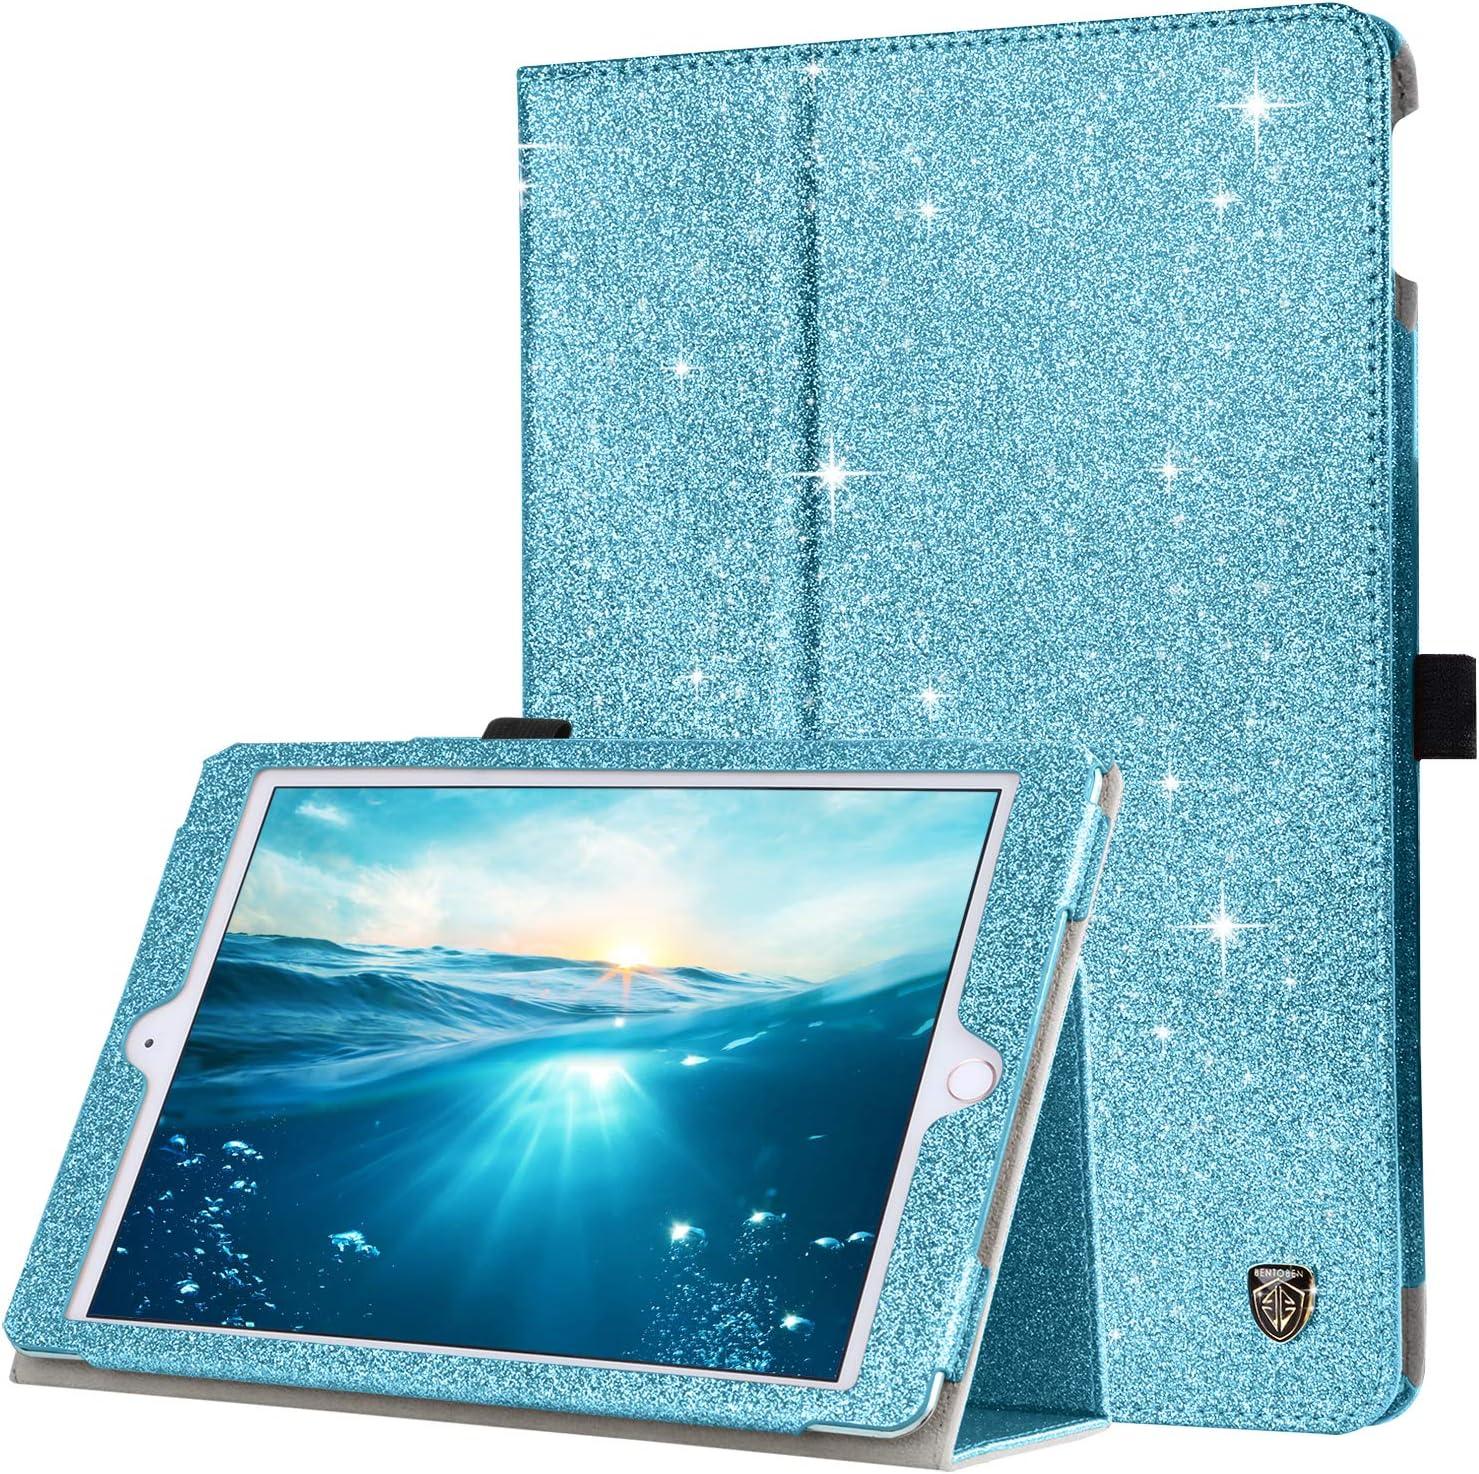 BENTOBEN iPad Air 2 Case, iPad Air 1 Case, iPad 6th Generation Case, iPad 5th Gen Case, Glitter PU Leather Folio Stand Smart Cover Auto Wake/Sleep Case for iPad Air 1/2, iPad 9.7 2018/2017, Deep Blue